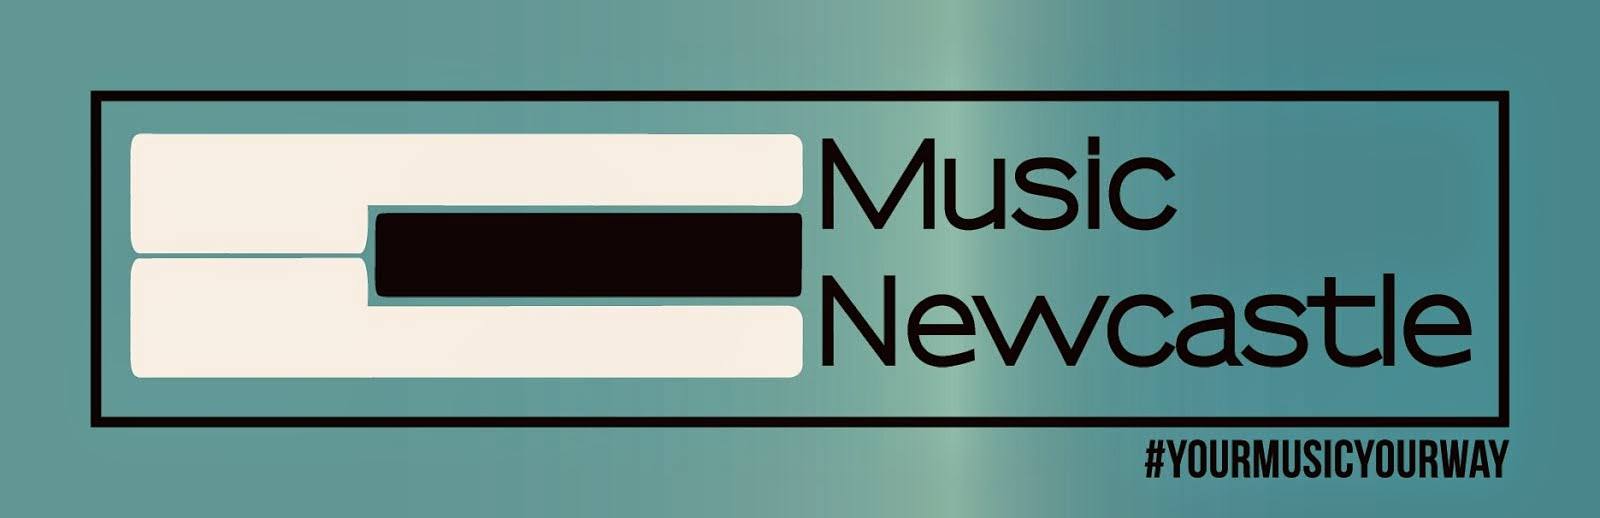 Music Newcastle